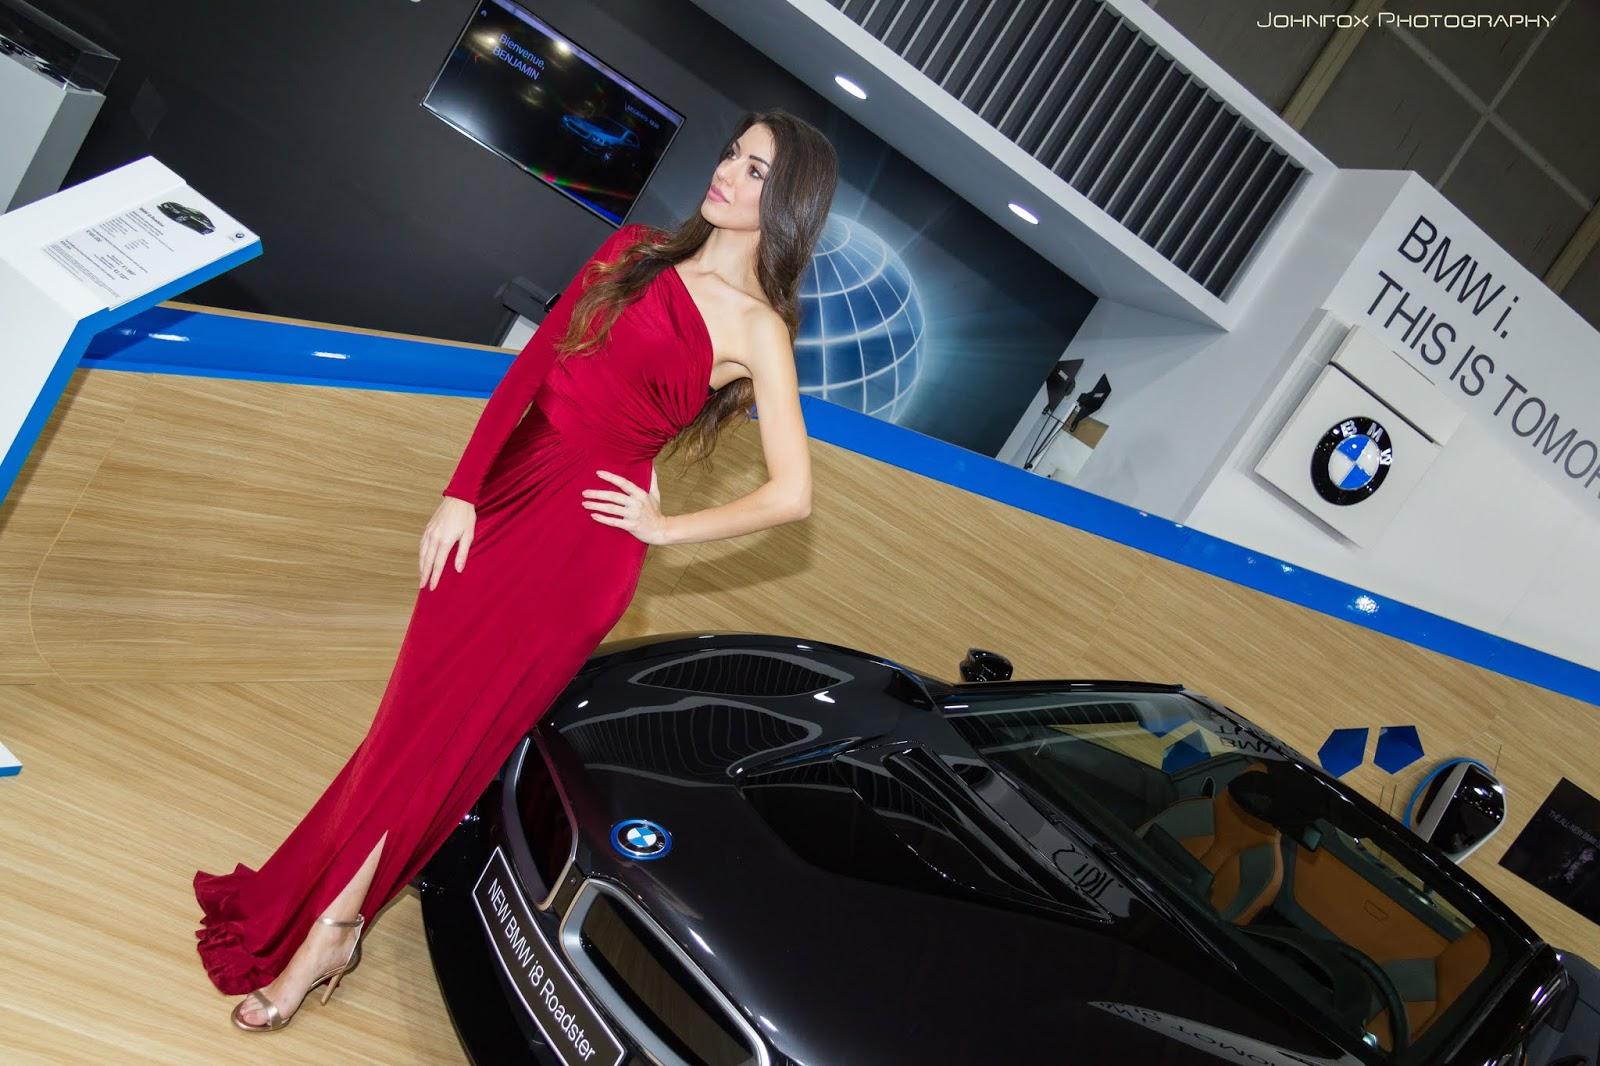 models2B252832Bof2B232529 Τα κορίτσια της Αυτοκίνησης! Έκθεση, μοντέλα, ΦΩΤΟ, φωτογραφίες